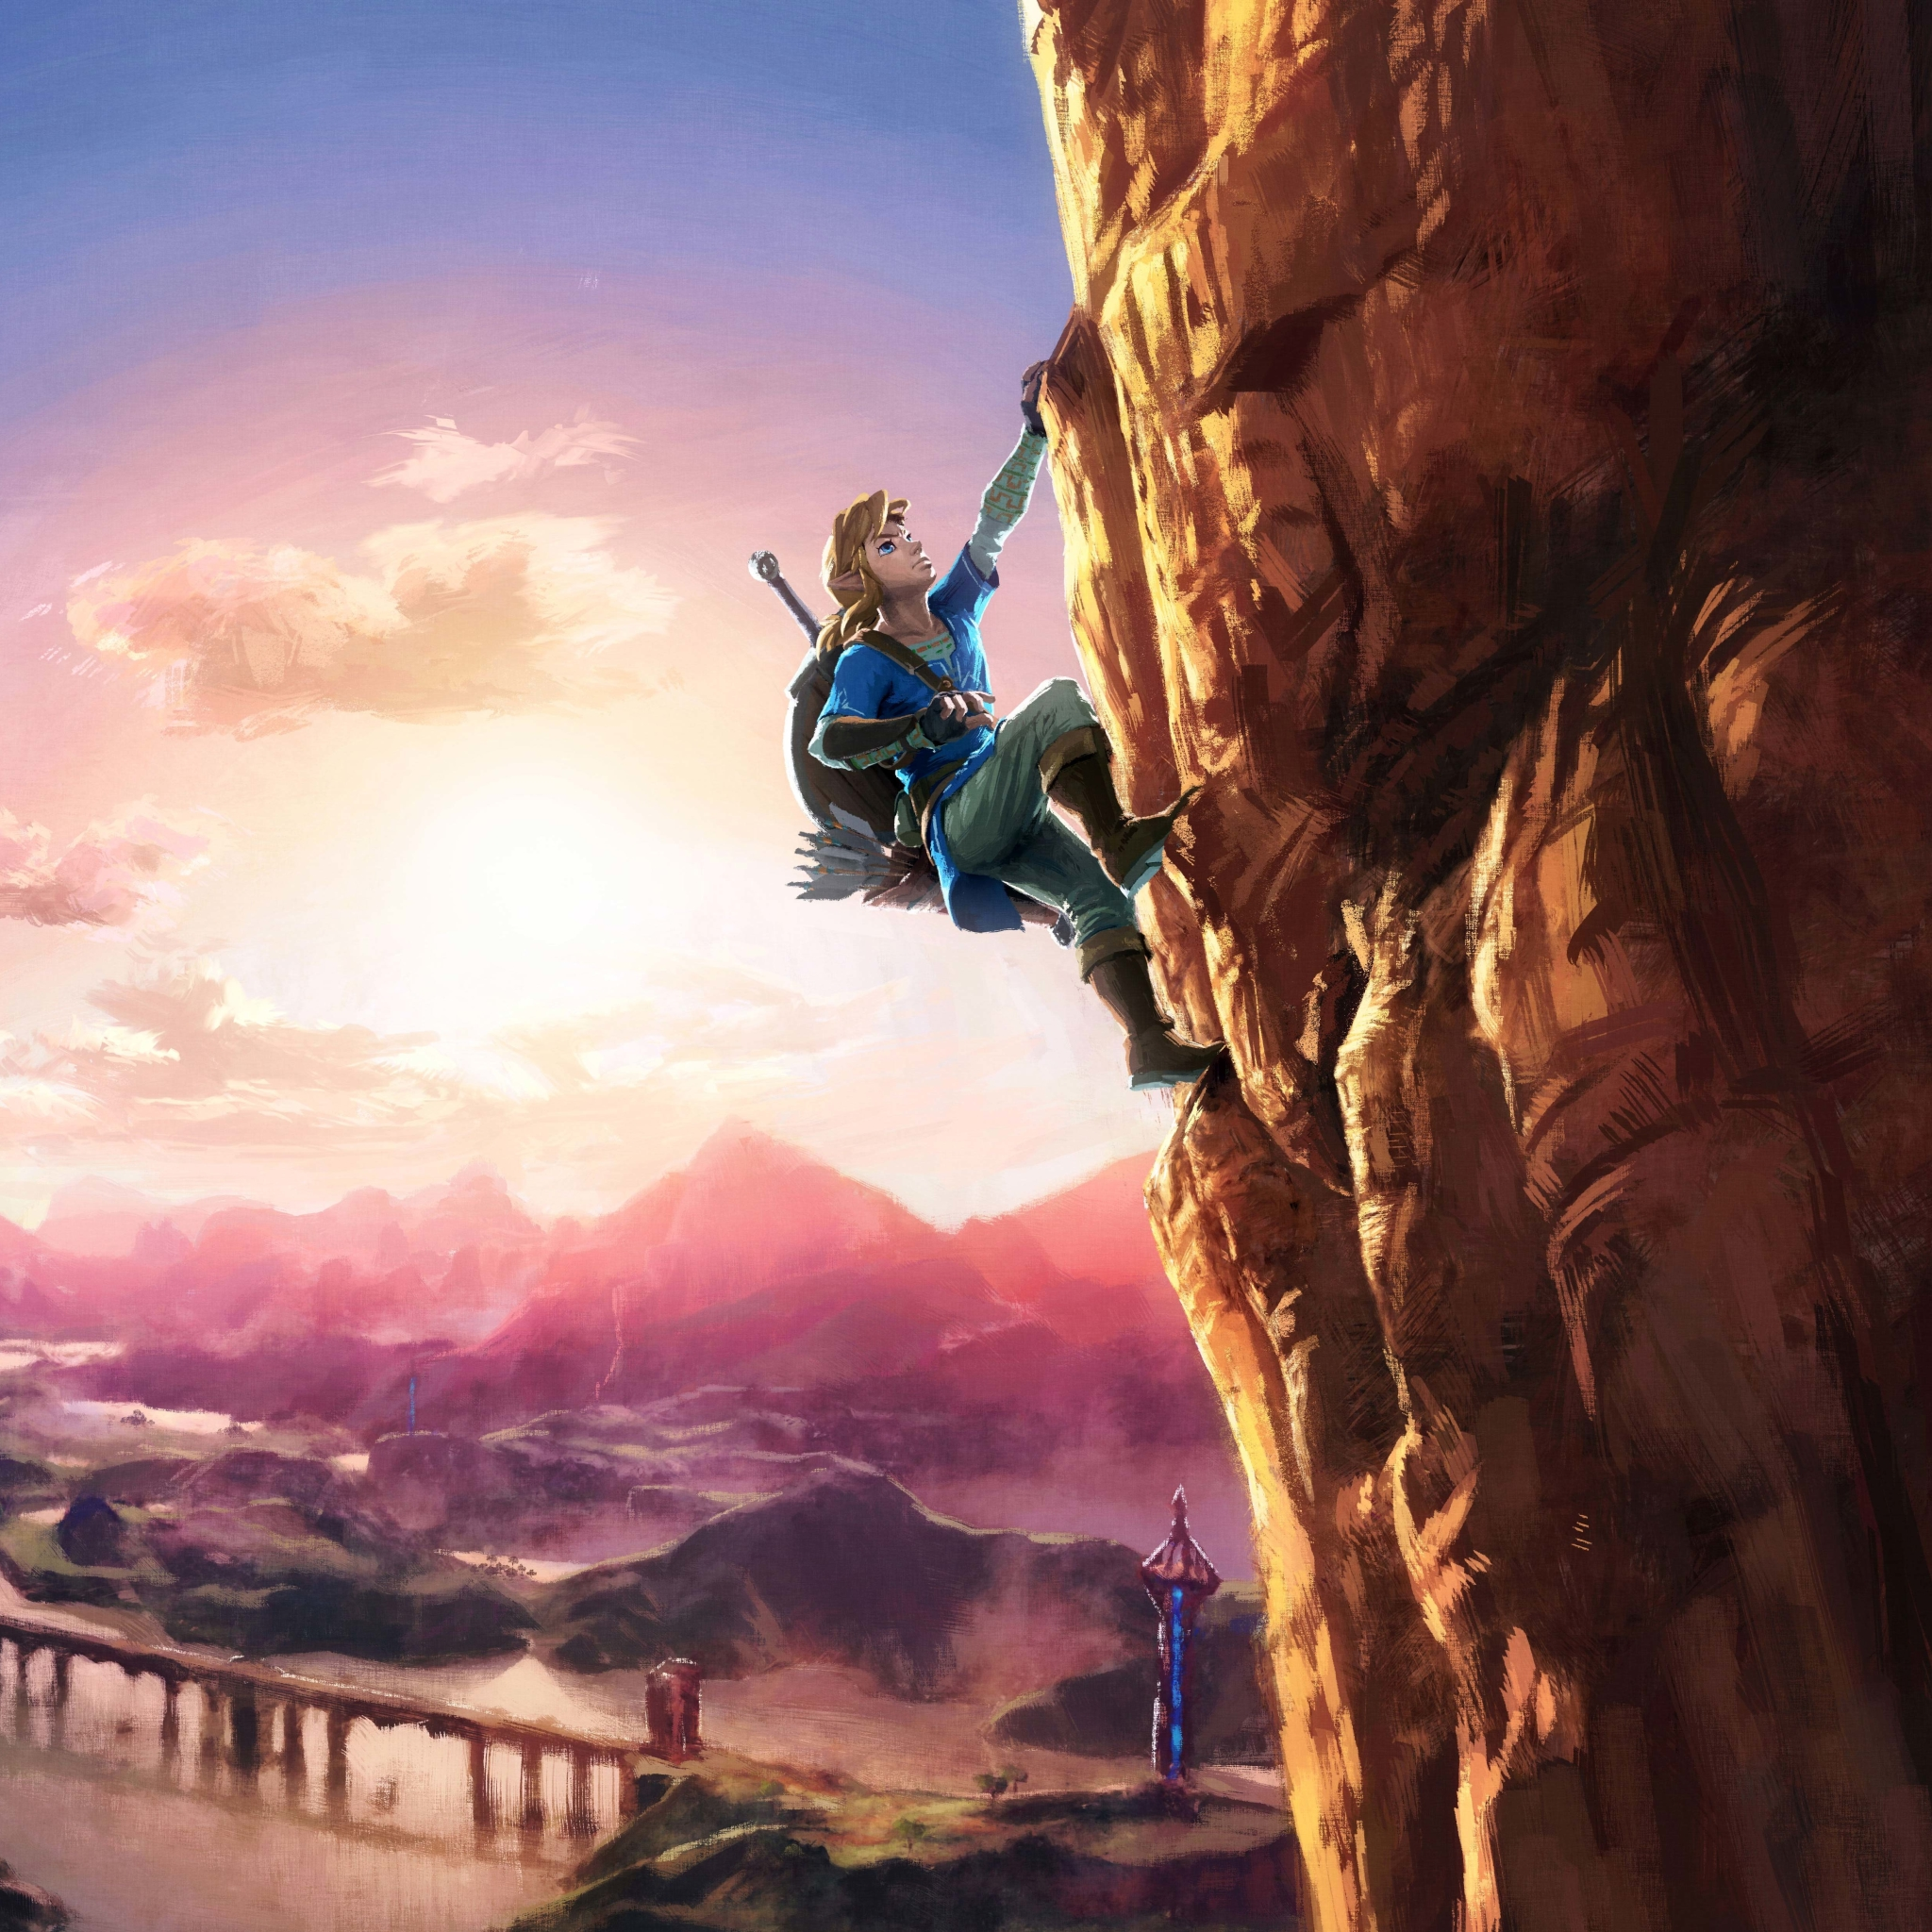 2048x2048 The Legend Of Zelda Breath Of The Wild 8k Ipad Air